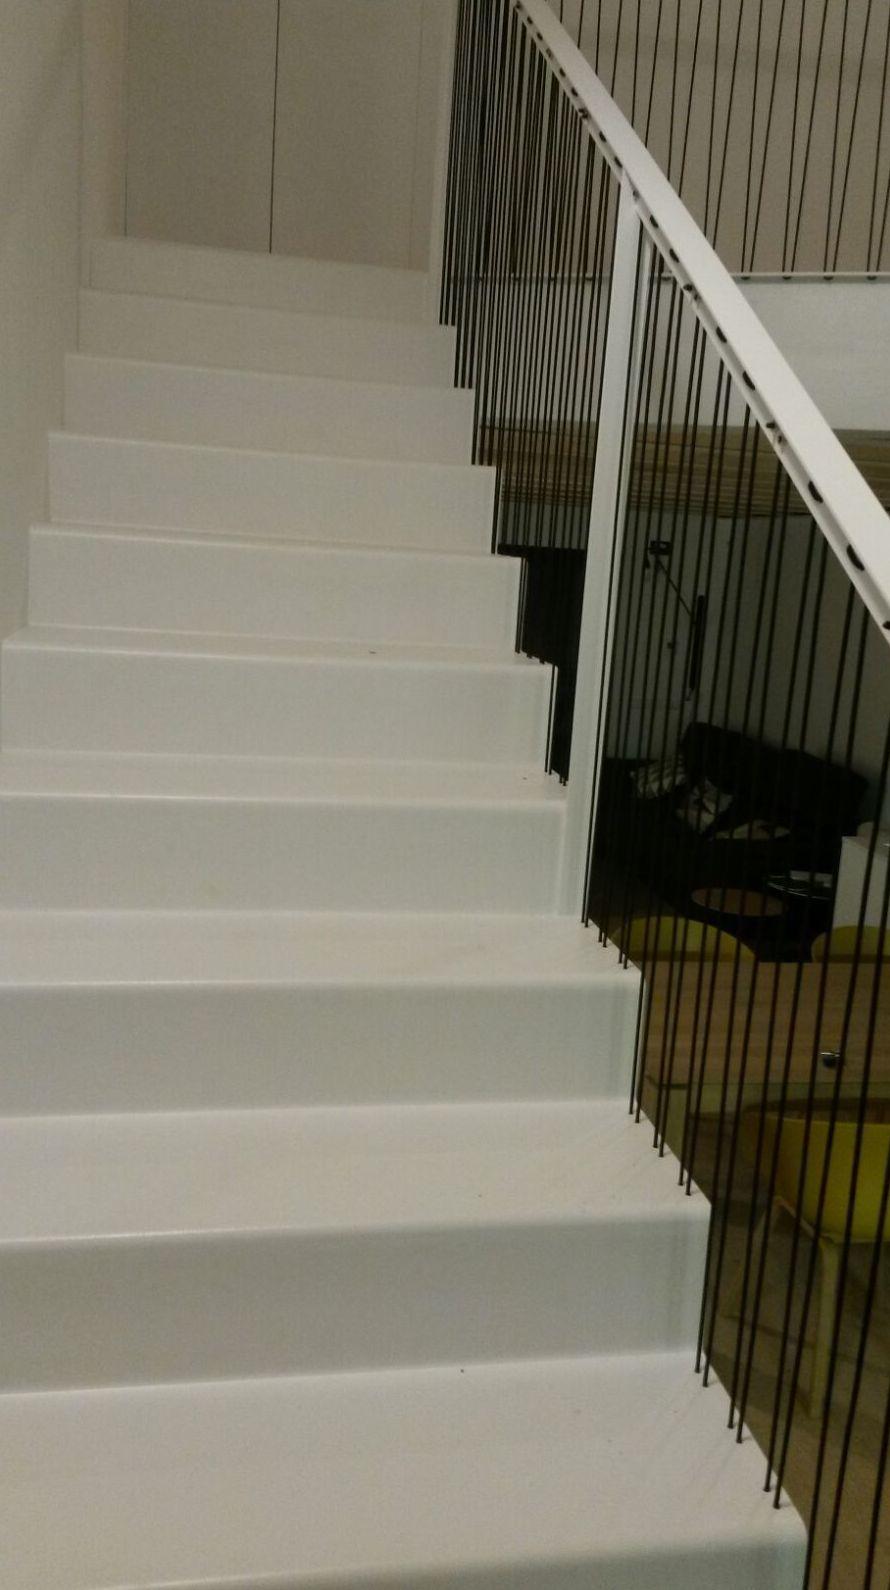 escalera plegada